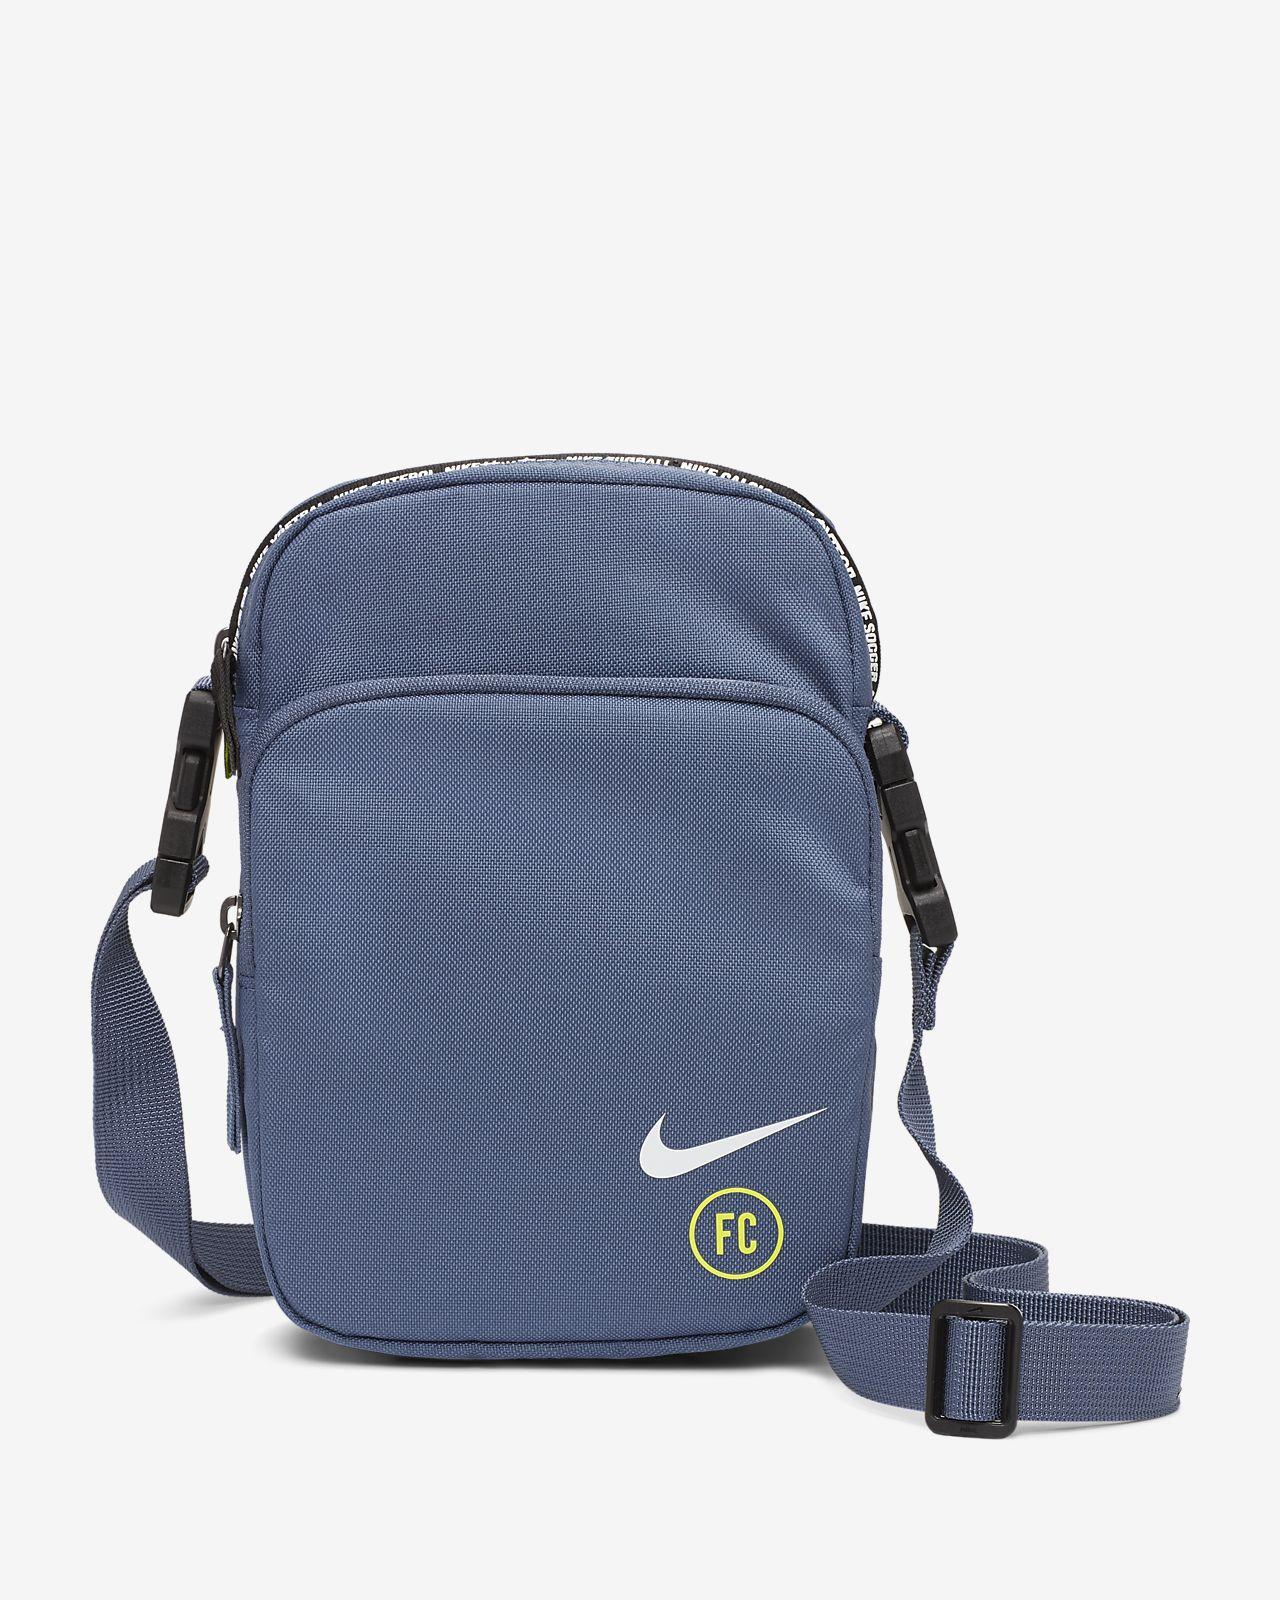 Nike Air Max 2.0 Cross Body Bag (Small Items). Nike NO